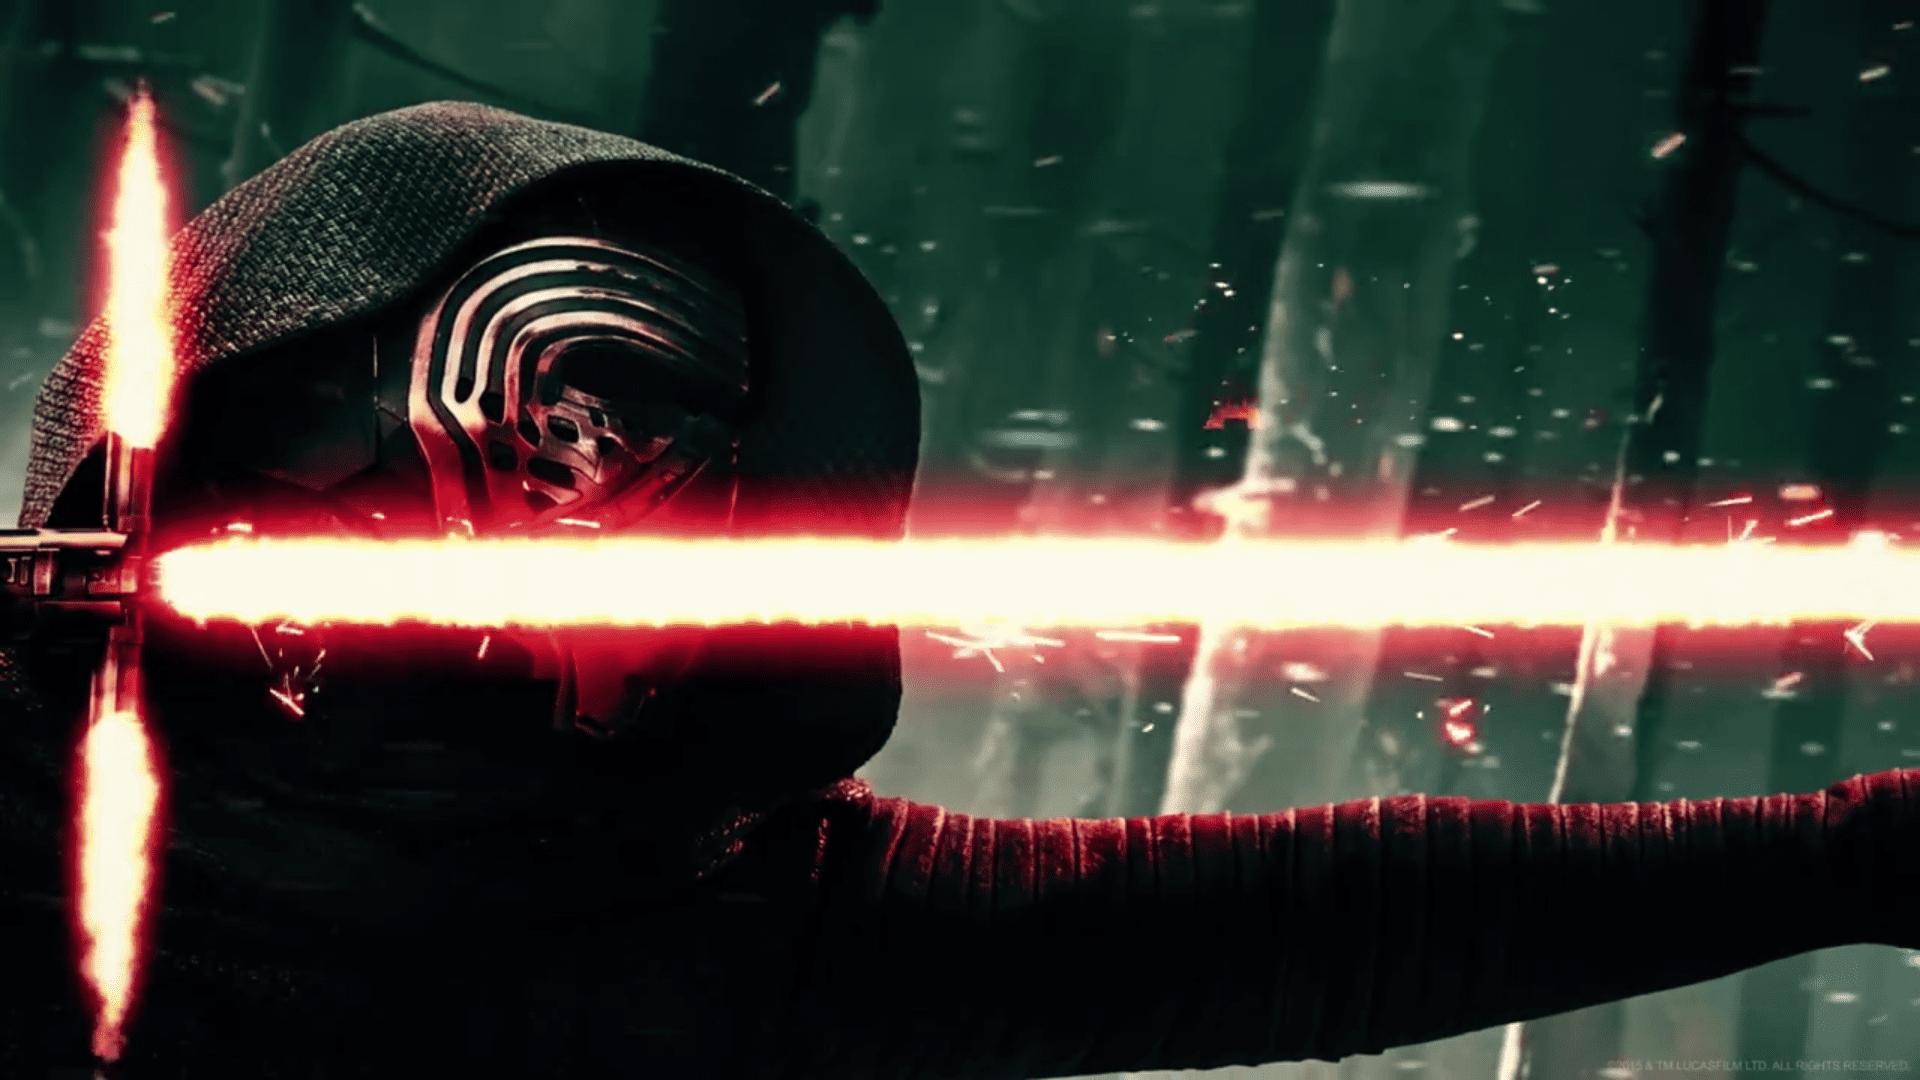 Star Wars Episode VII The Force Awakens Wallpaper 088